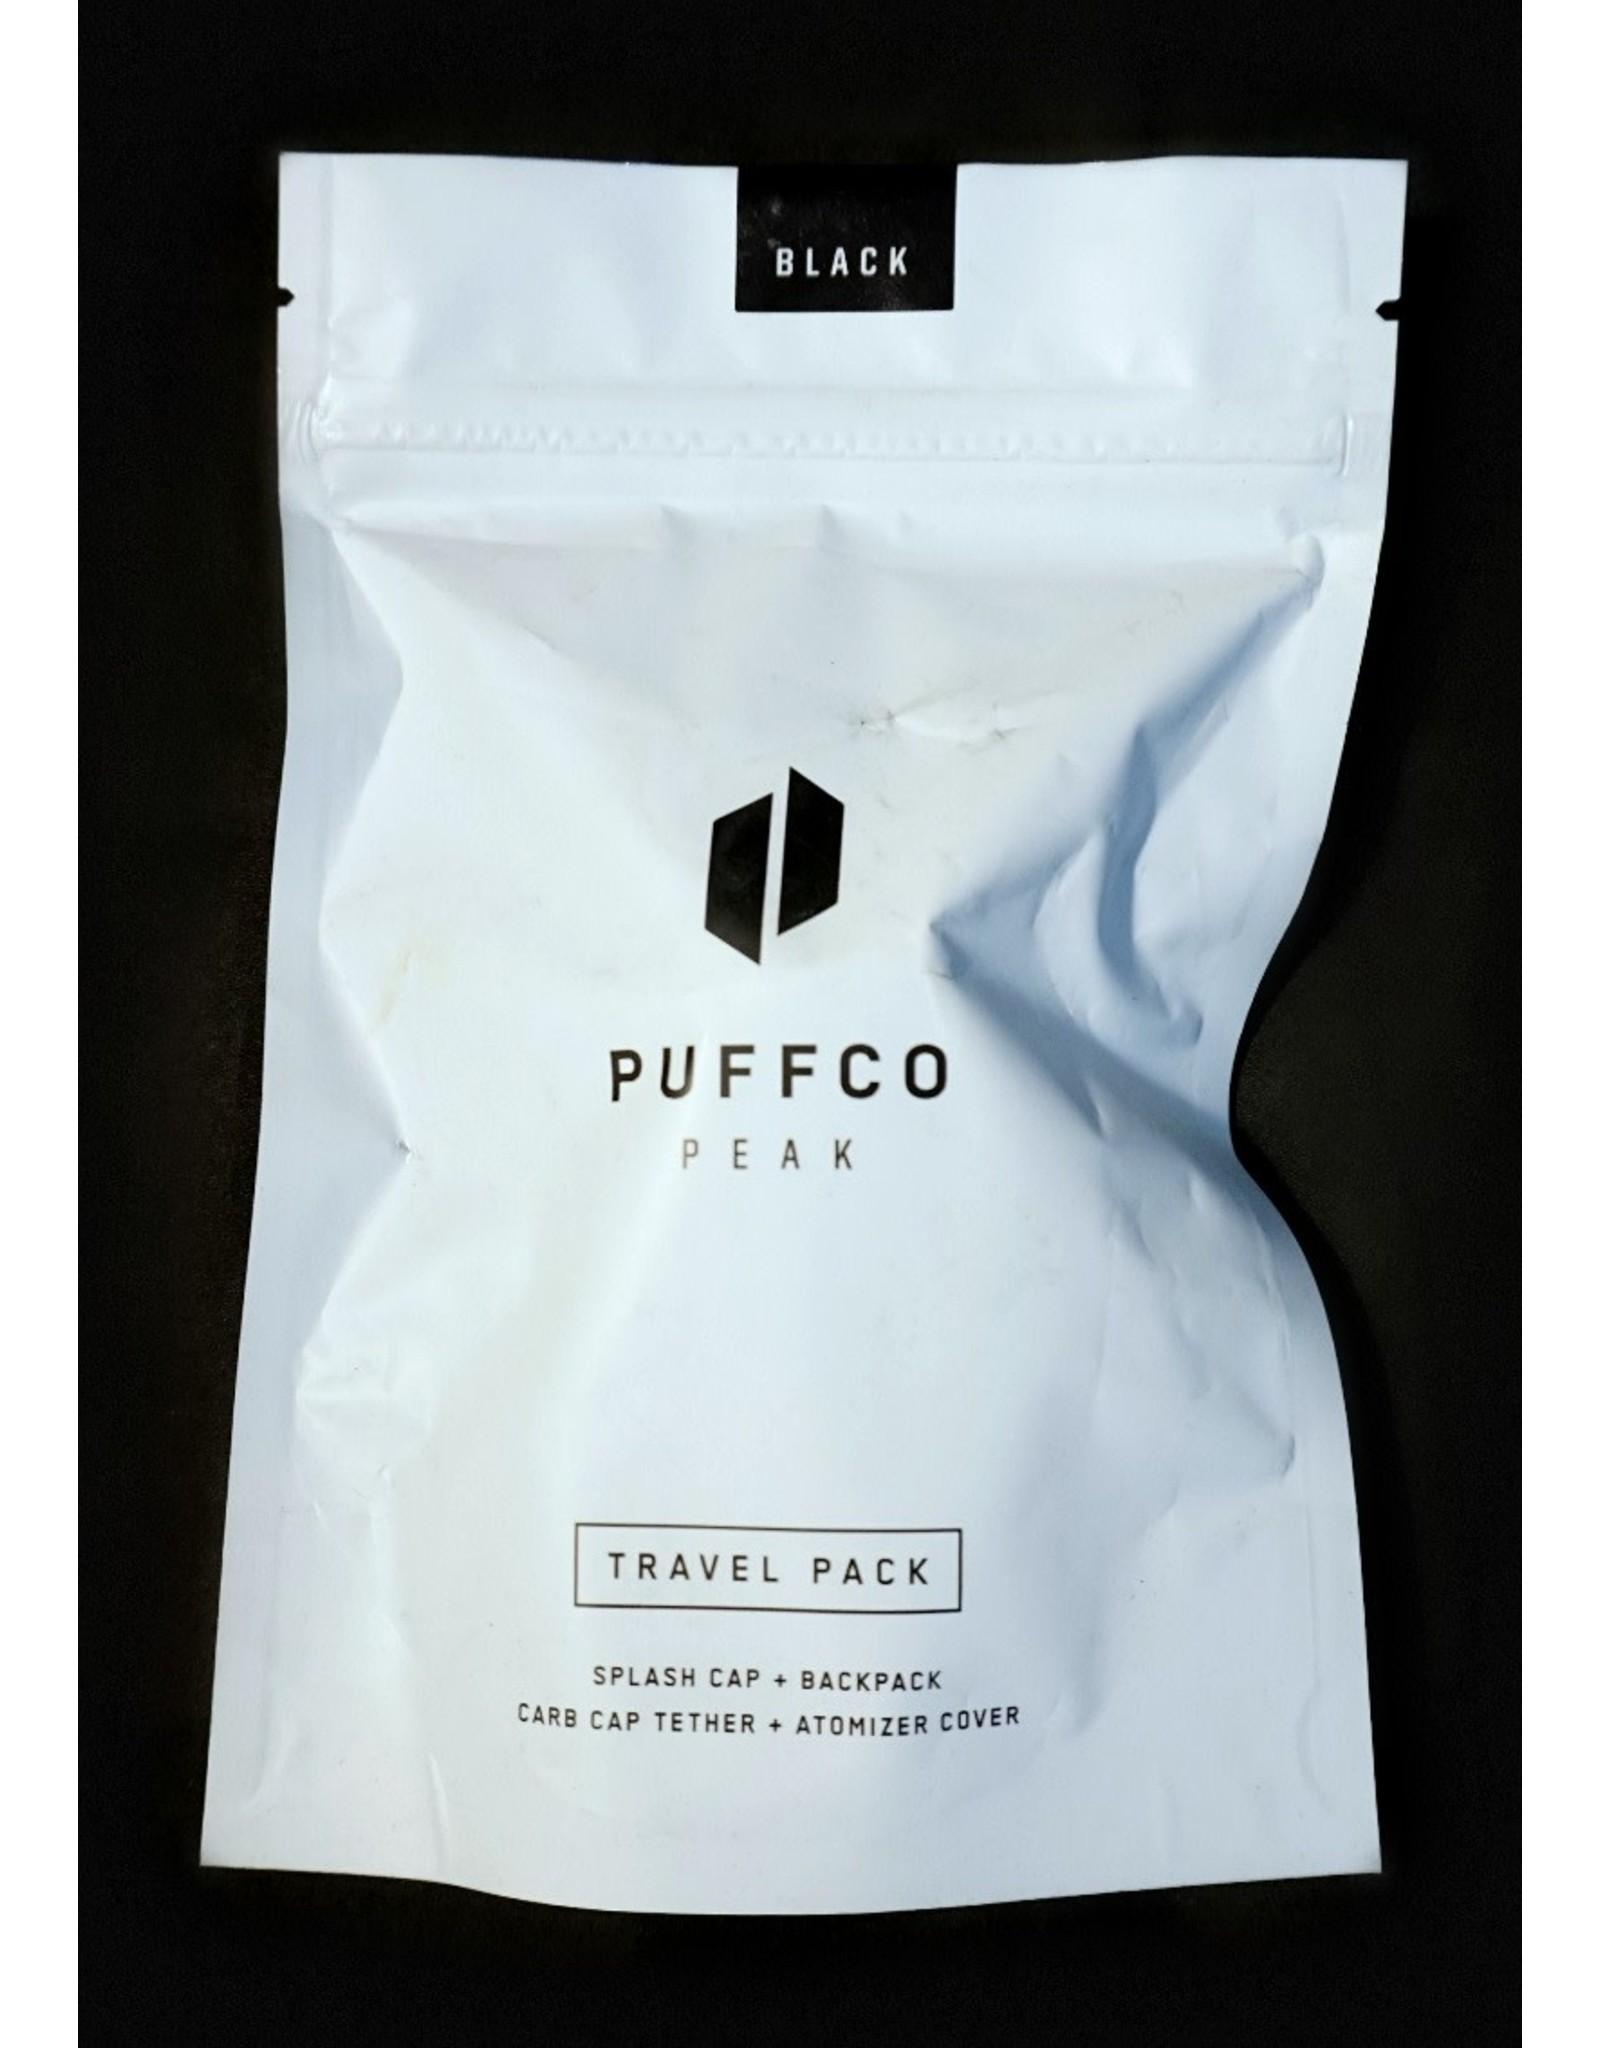 Puffco Peak Travel Pack - Black